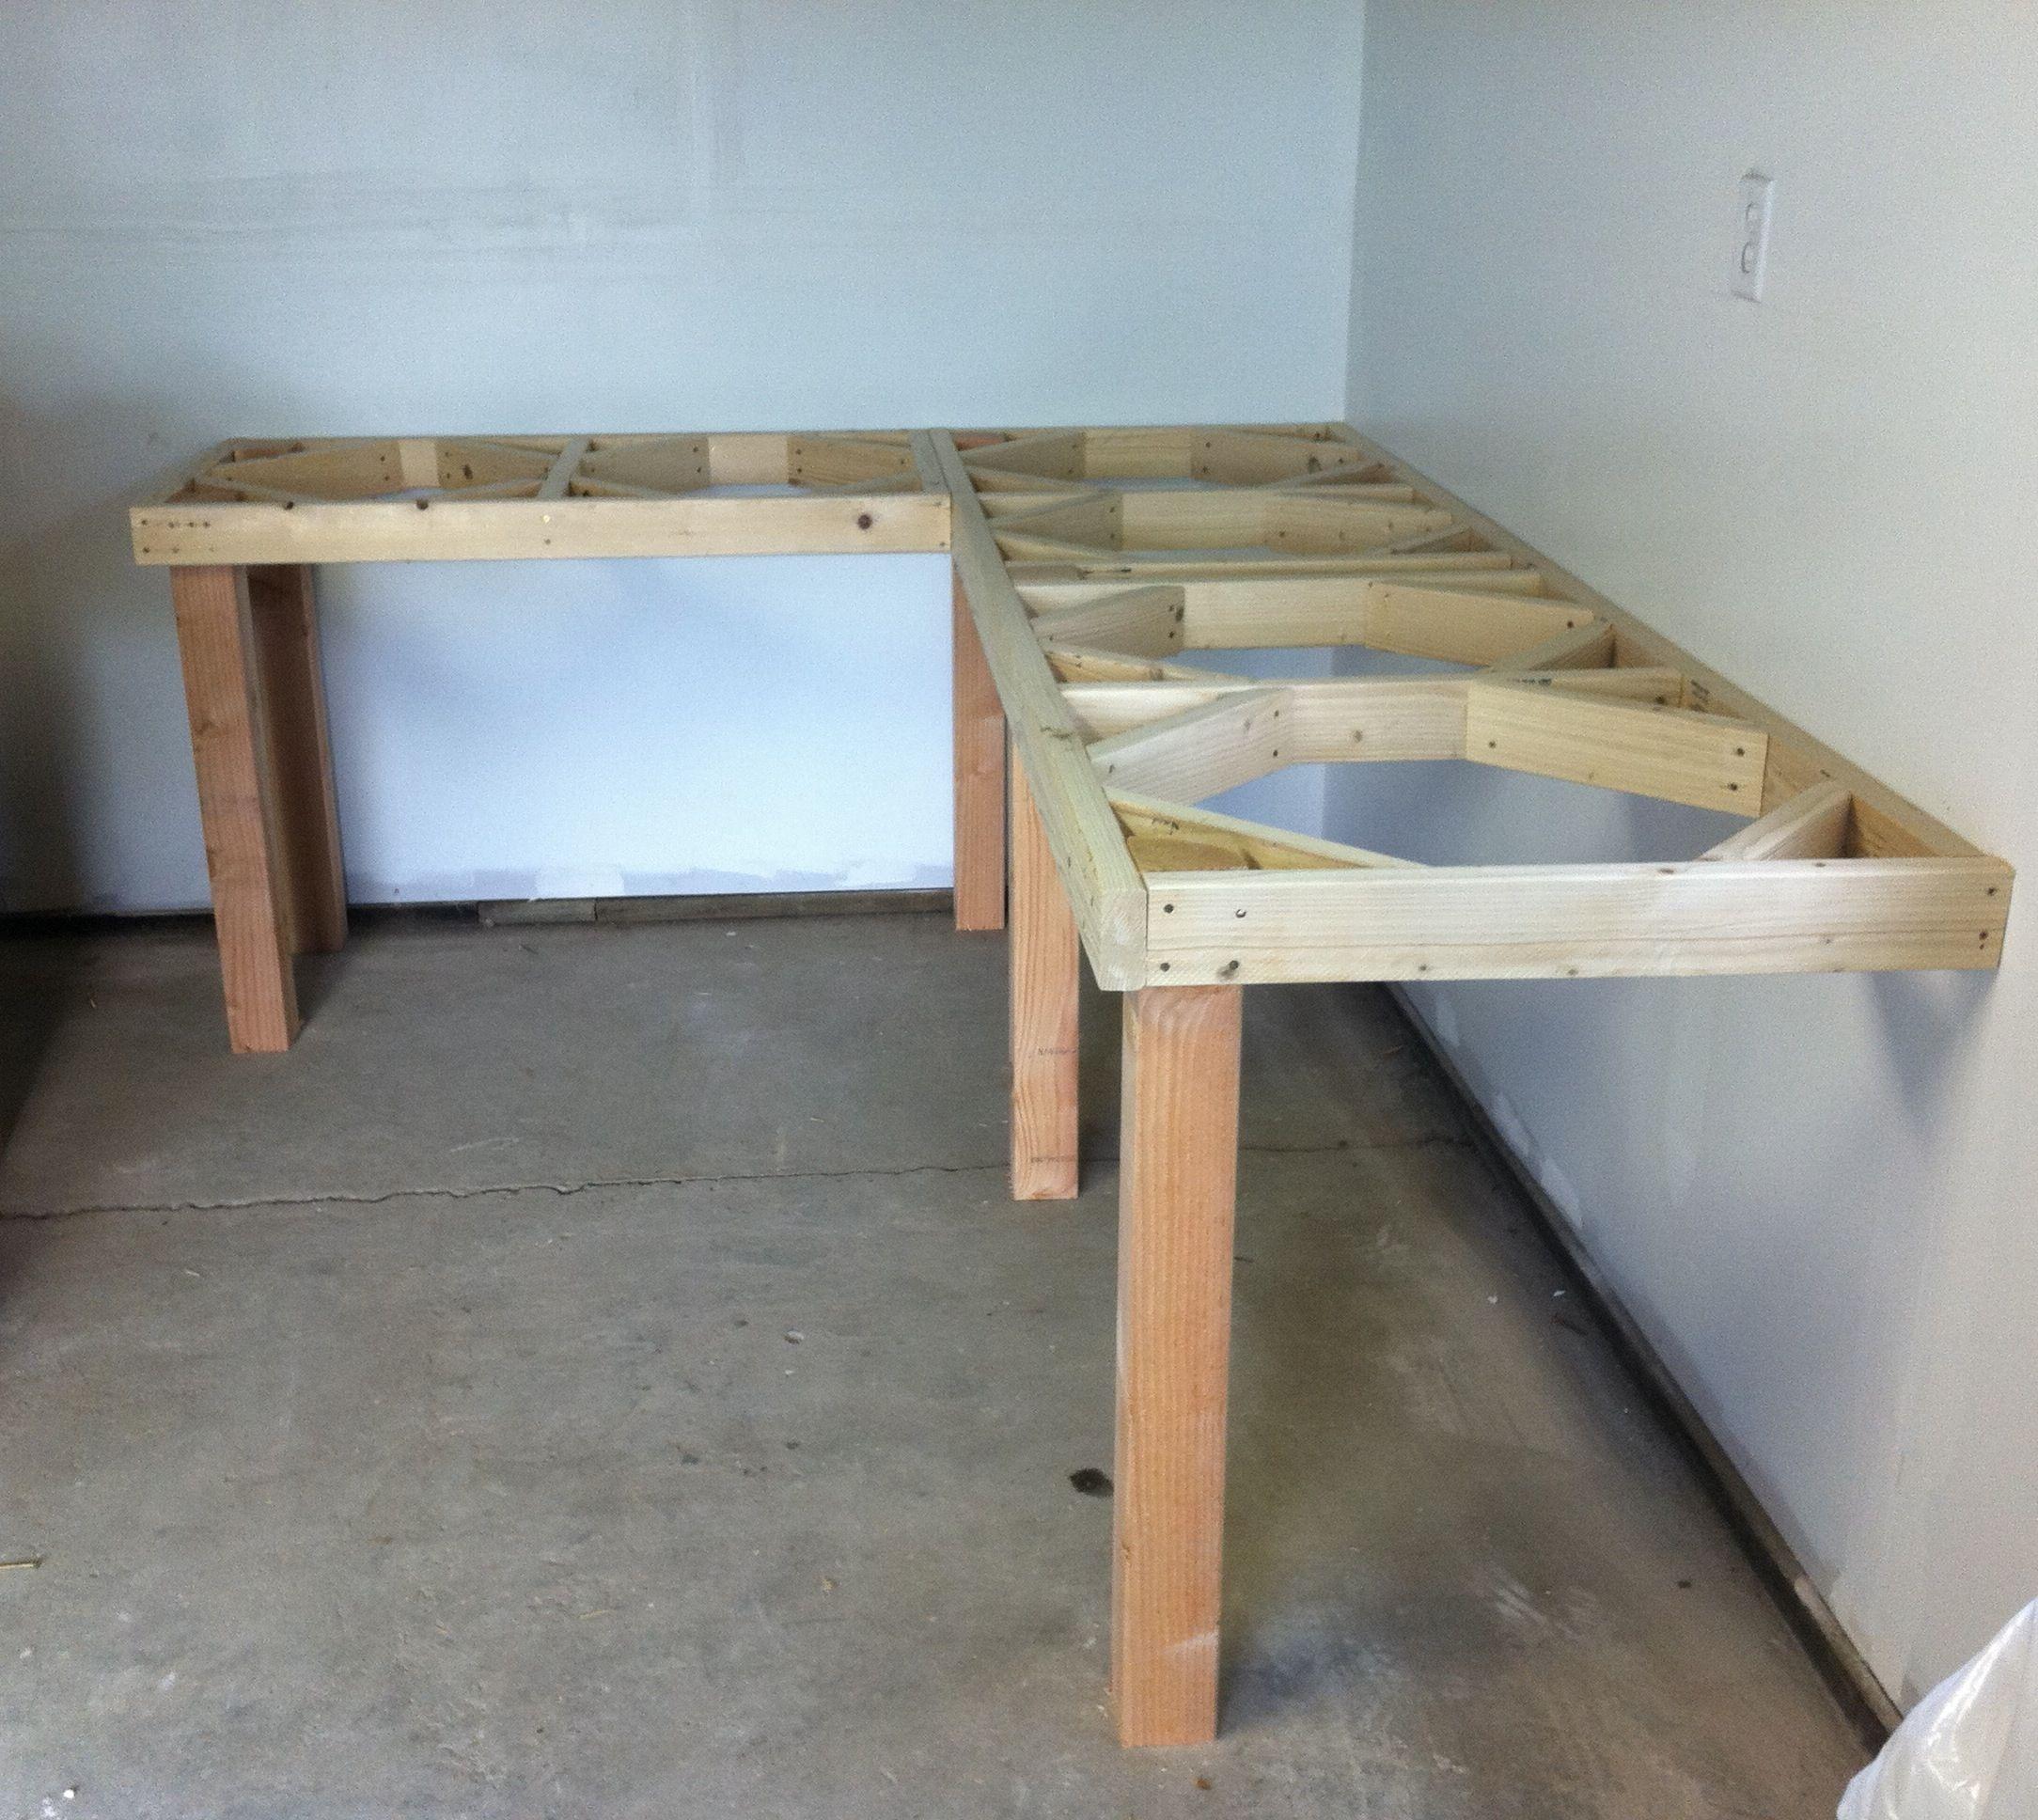 2x4 Vs 2x6 Garage Walls: Garage Corner Workbench - Google Search